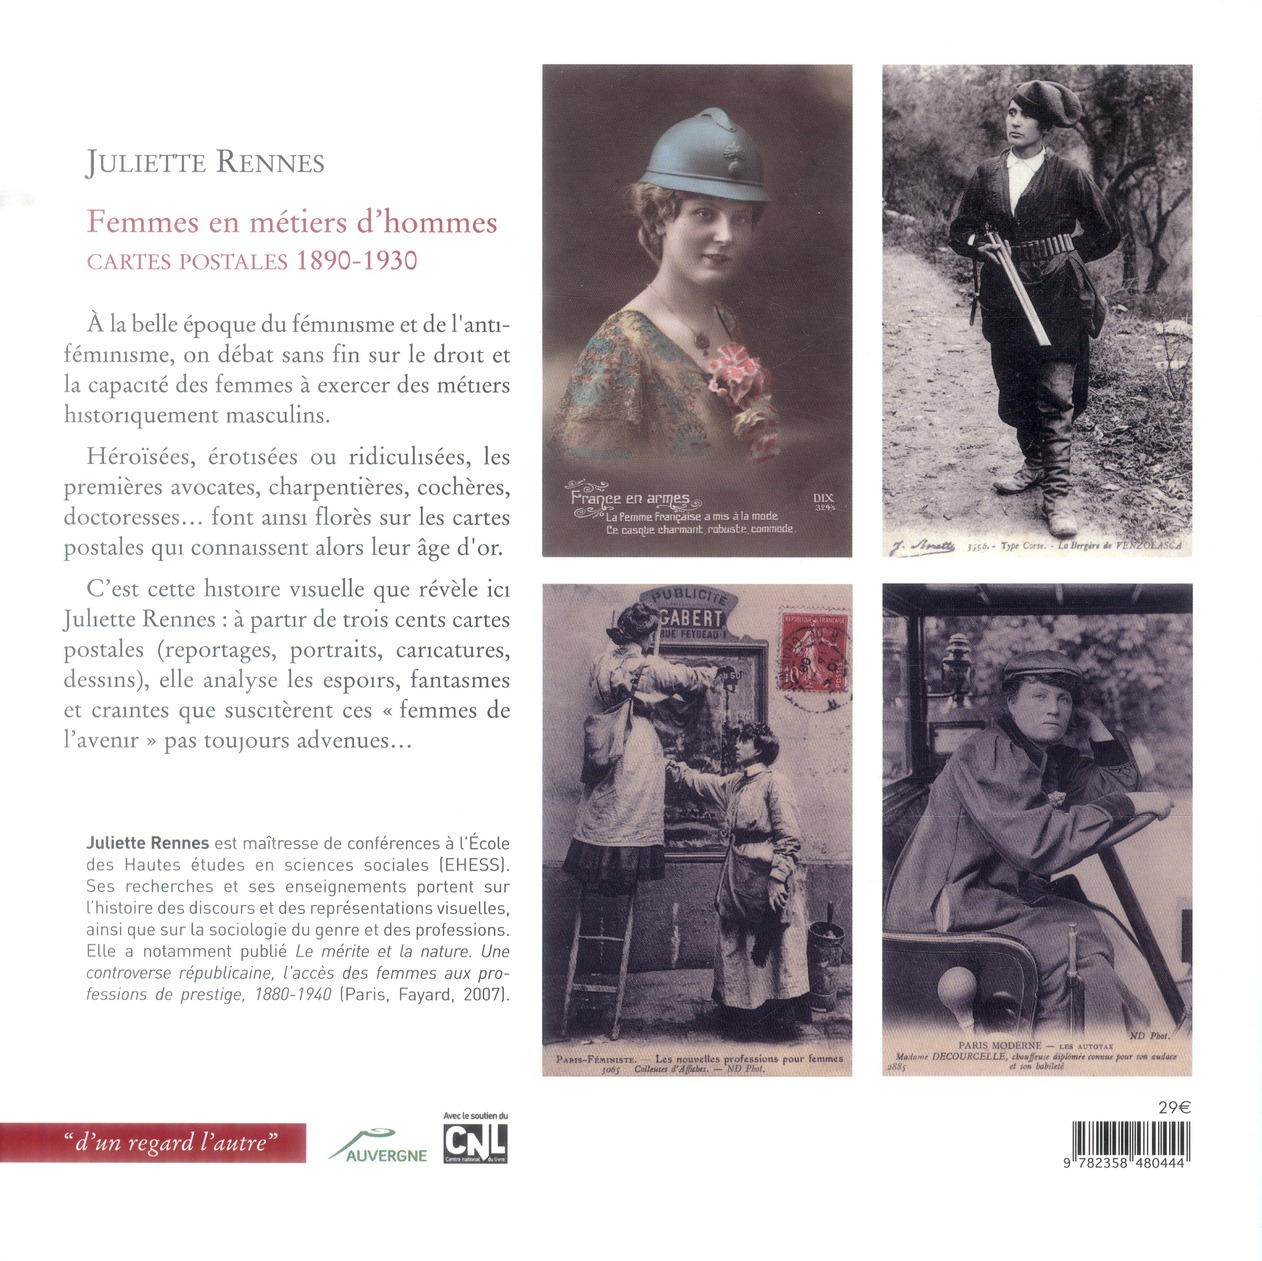 Femmes en métiers d'hommes ; cartes postales (1890-1920)